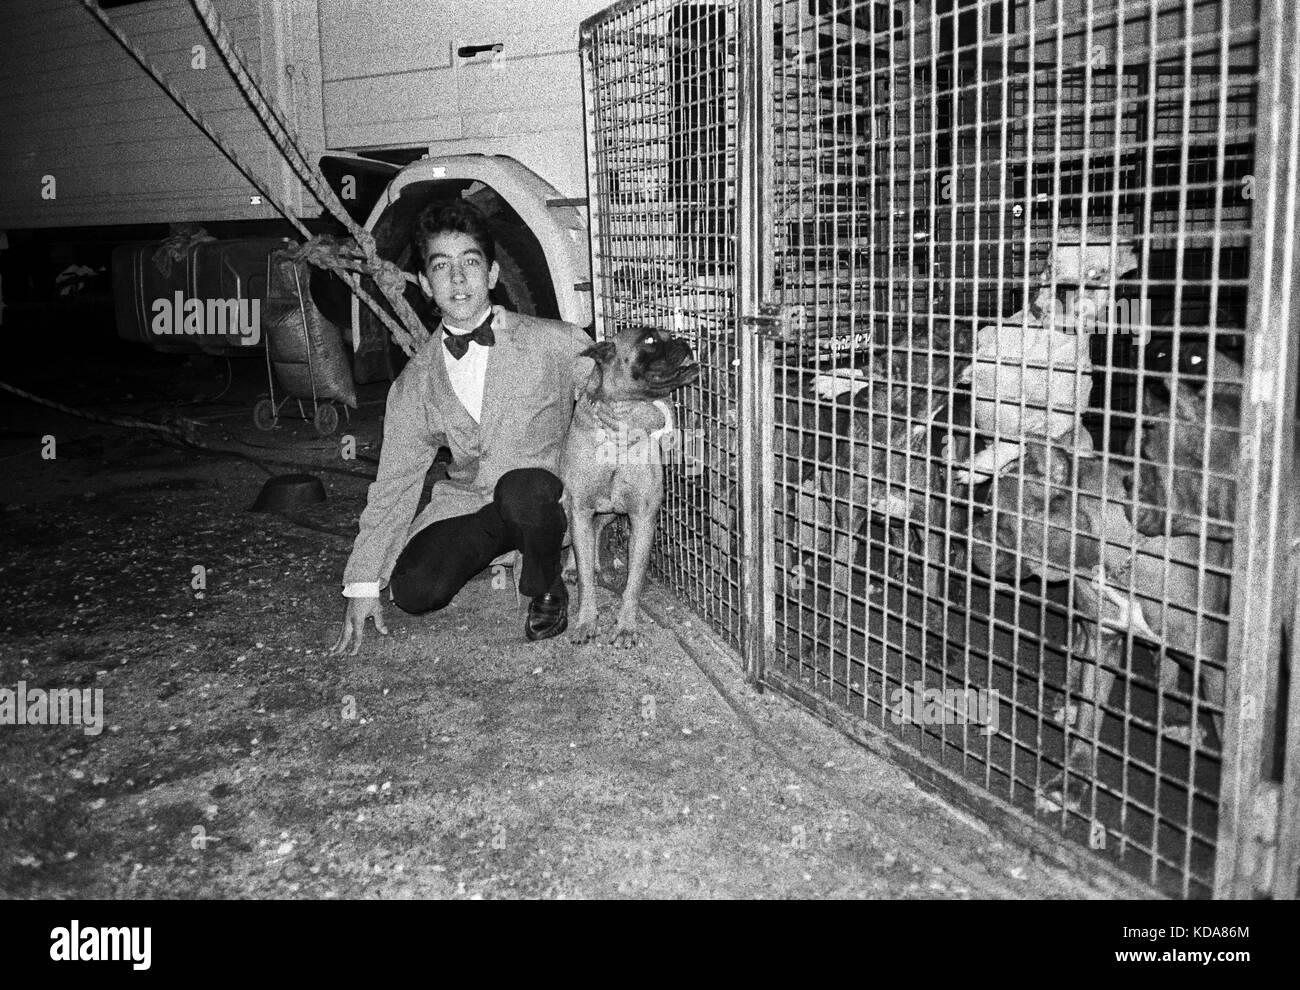 Circus dogs and boy. Lisbon, 1990-1992, Portugal - Stock Image